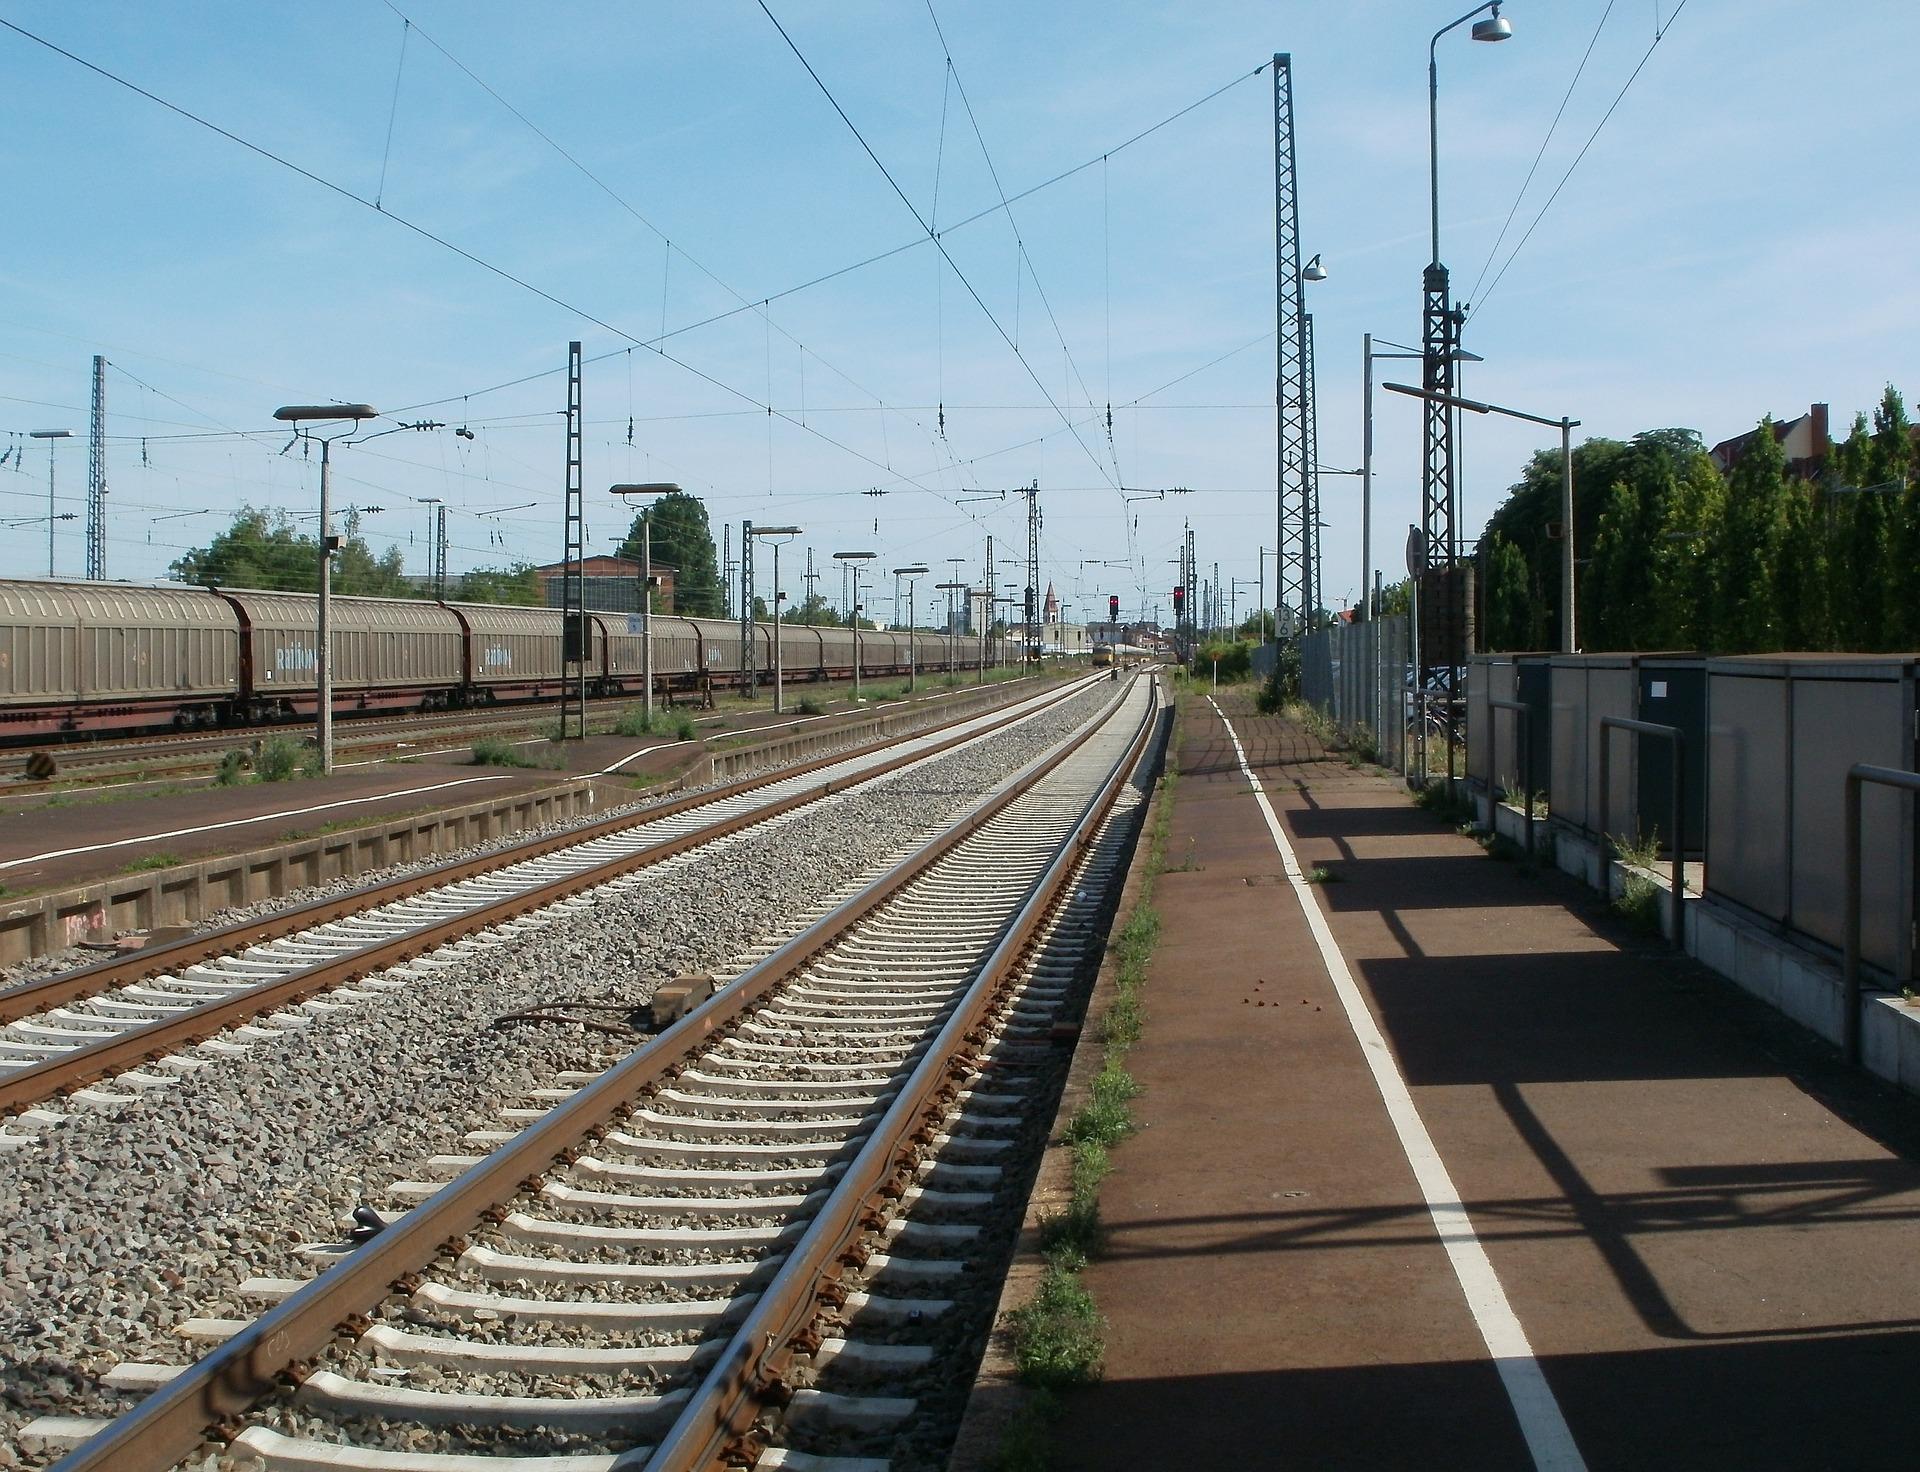 trainstation-837624_1920